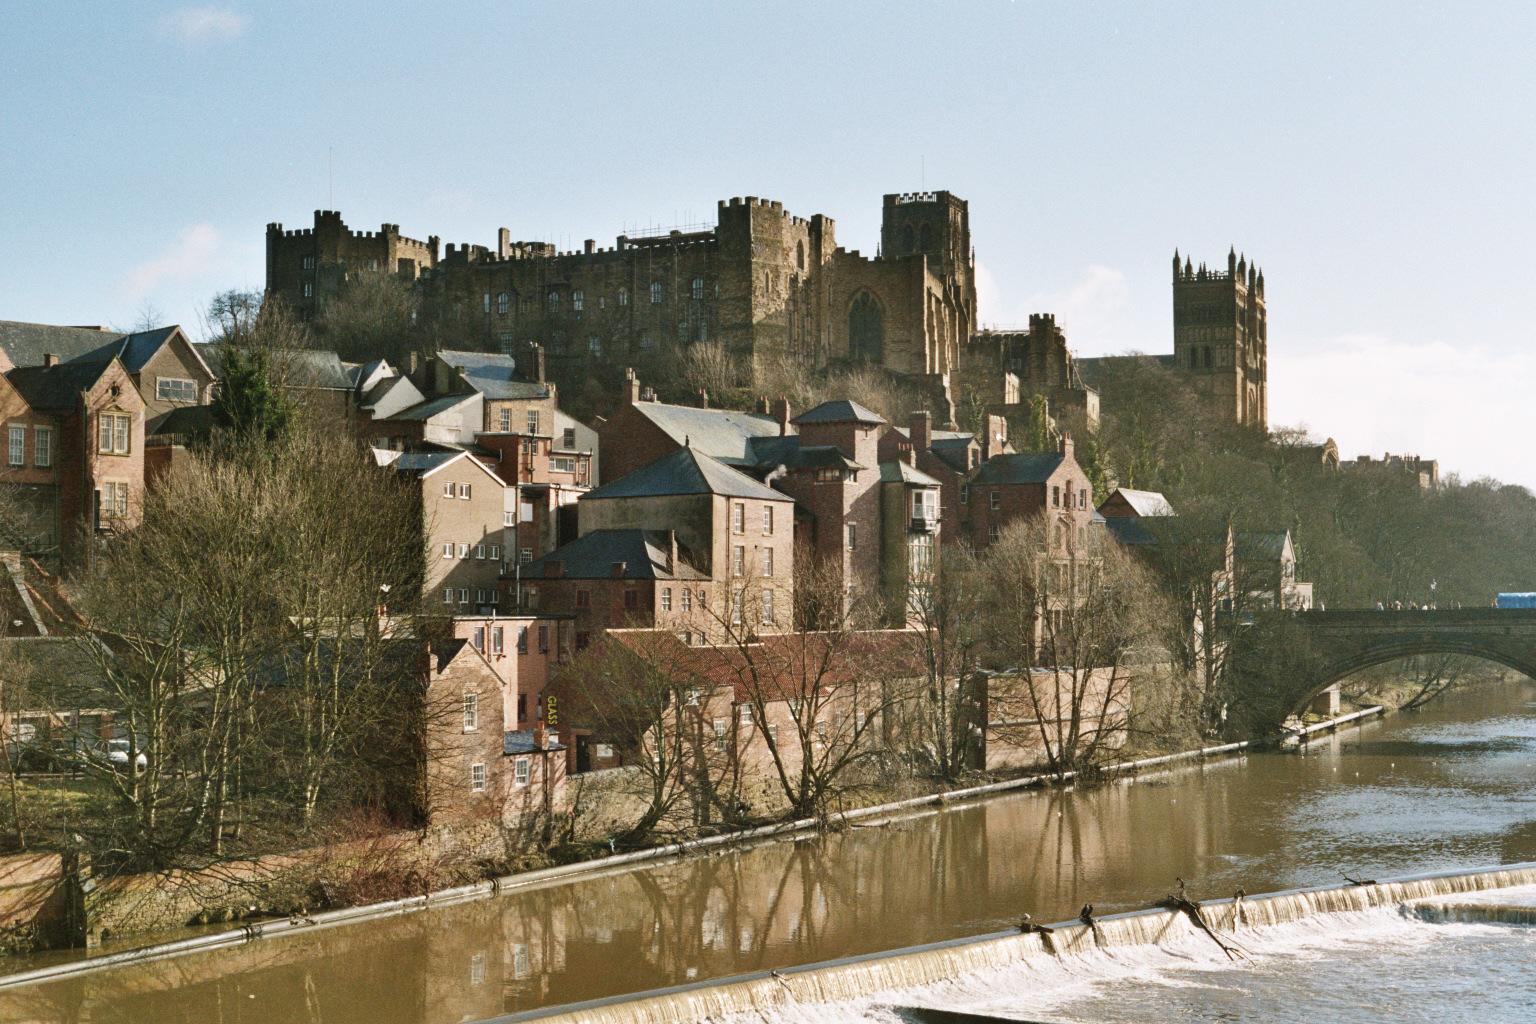 https://i2.wp.com/upload.wikimedia.org/wikipedia/commons/1/11/Durham_castle.jpg